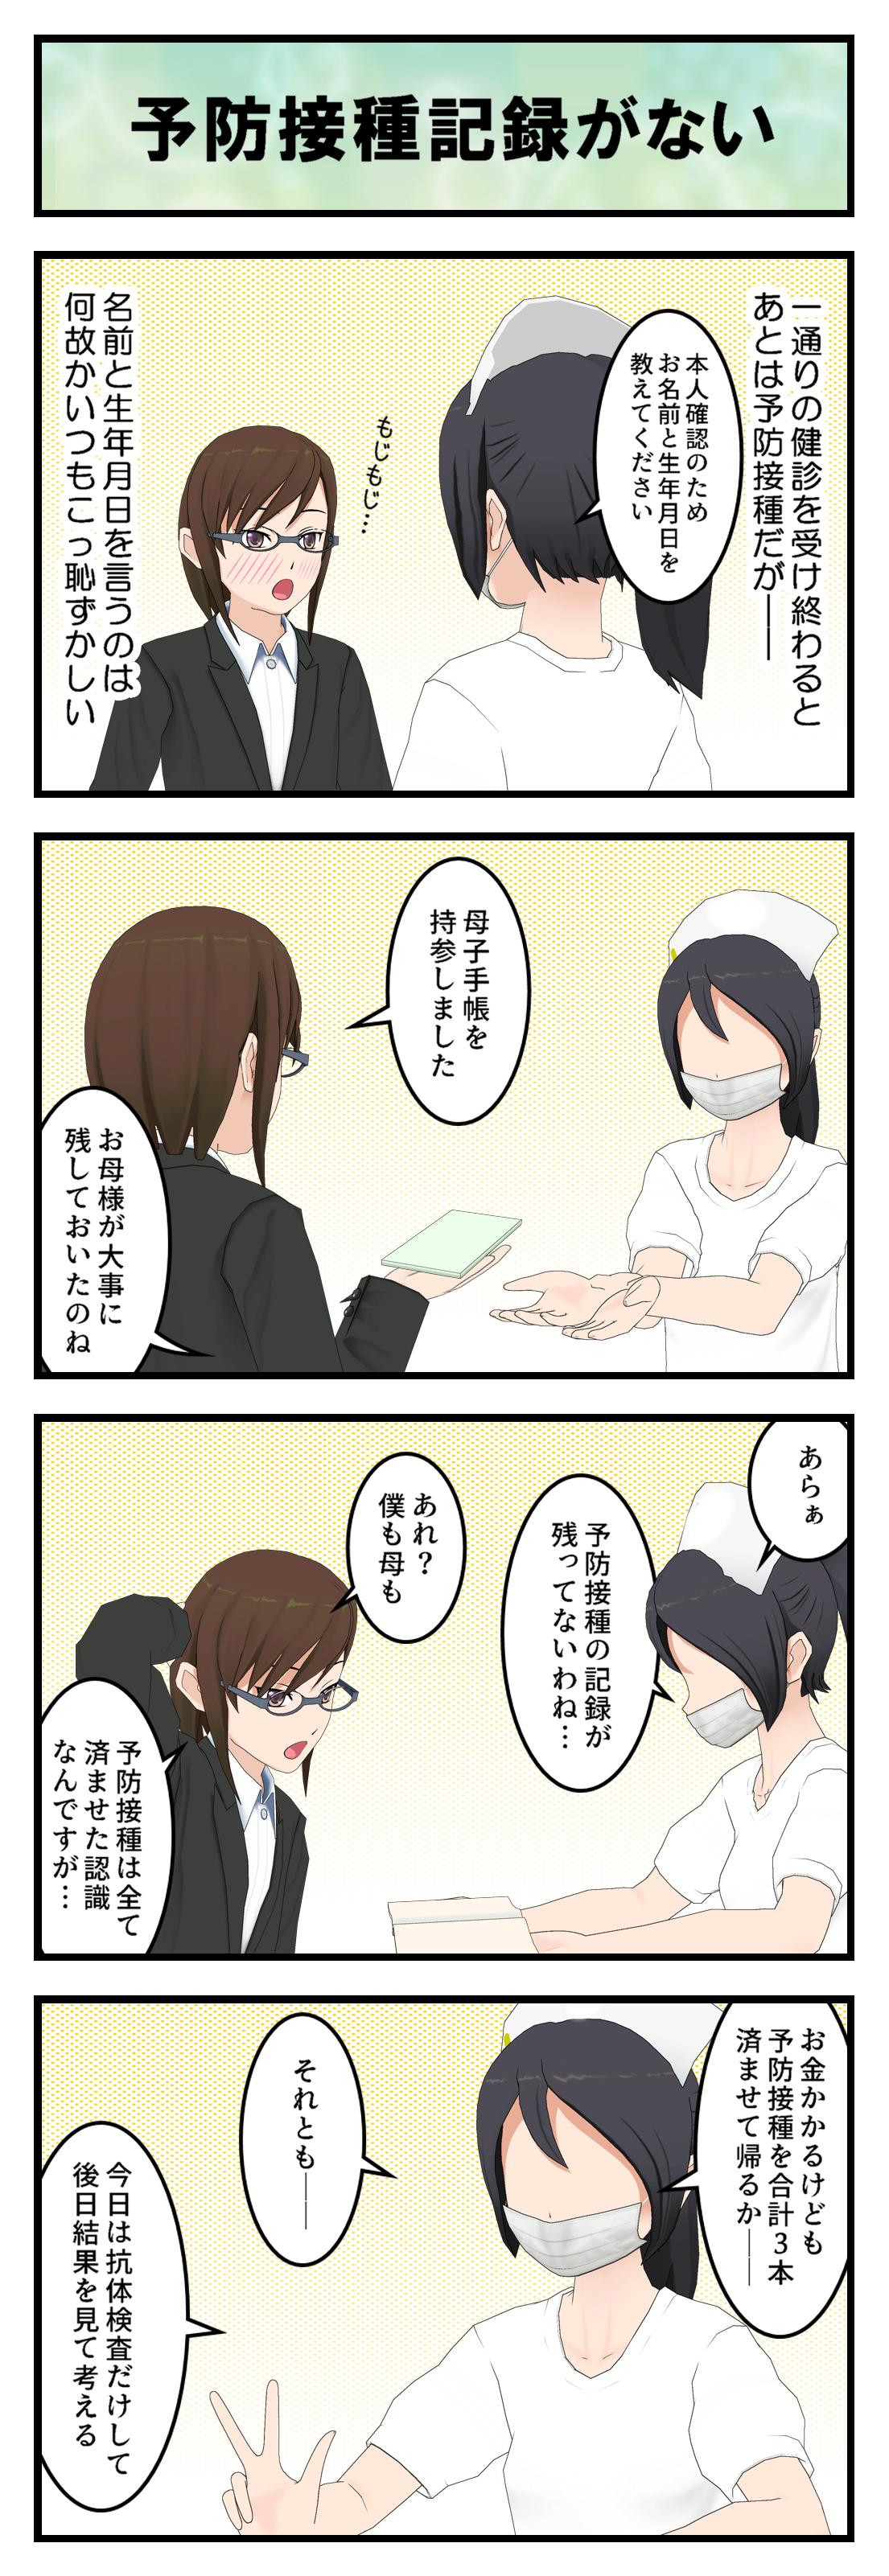 Q150_予防接種_001